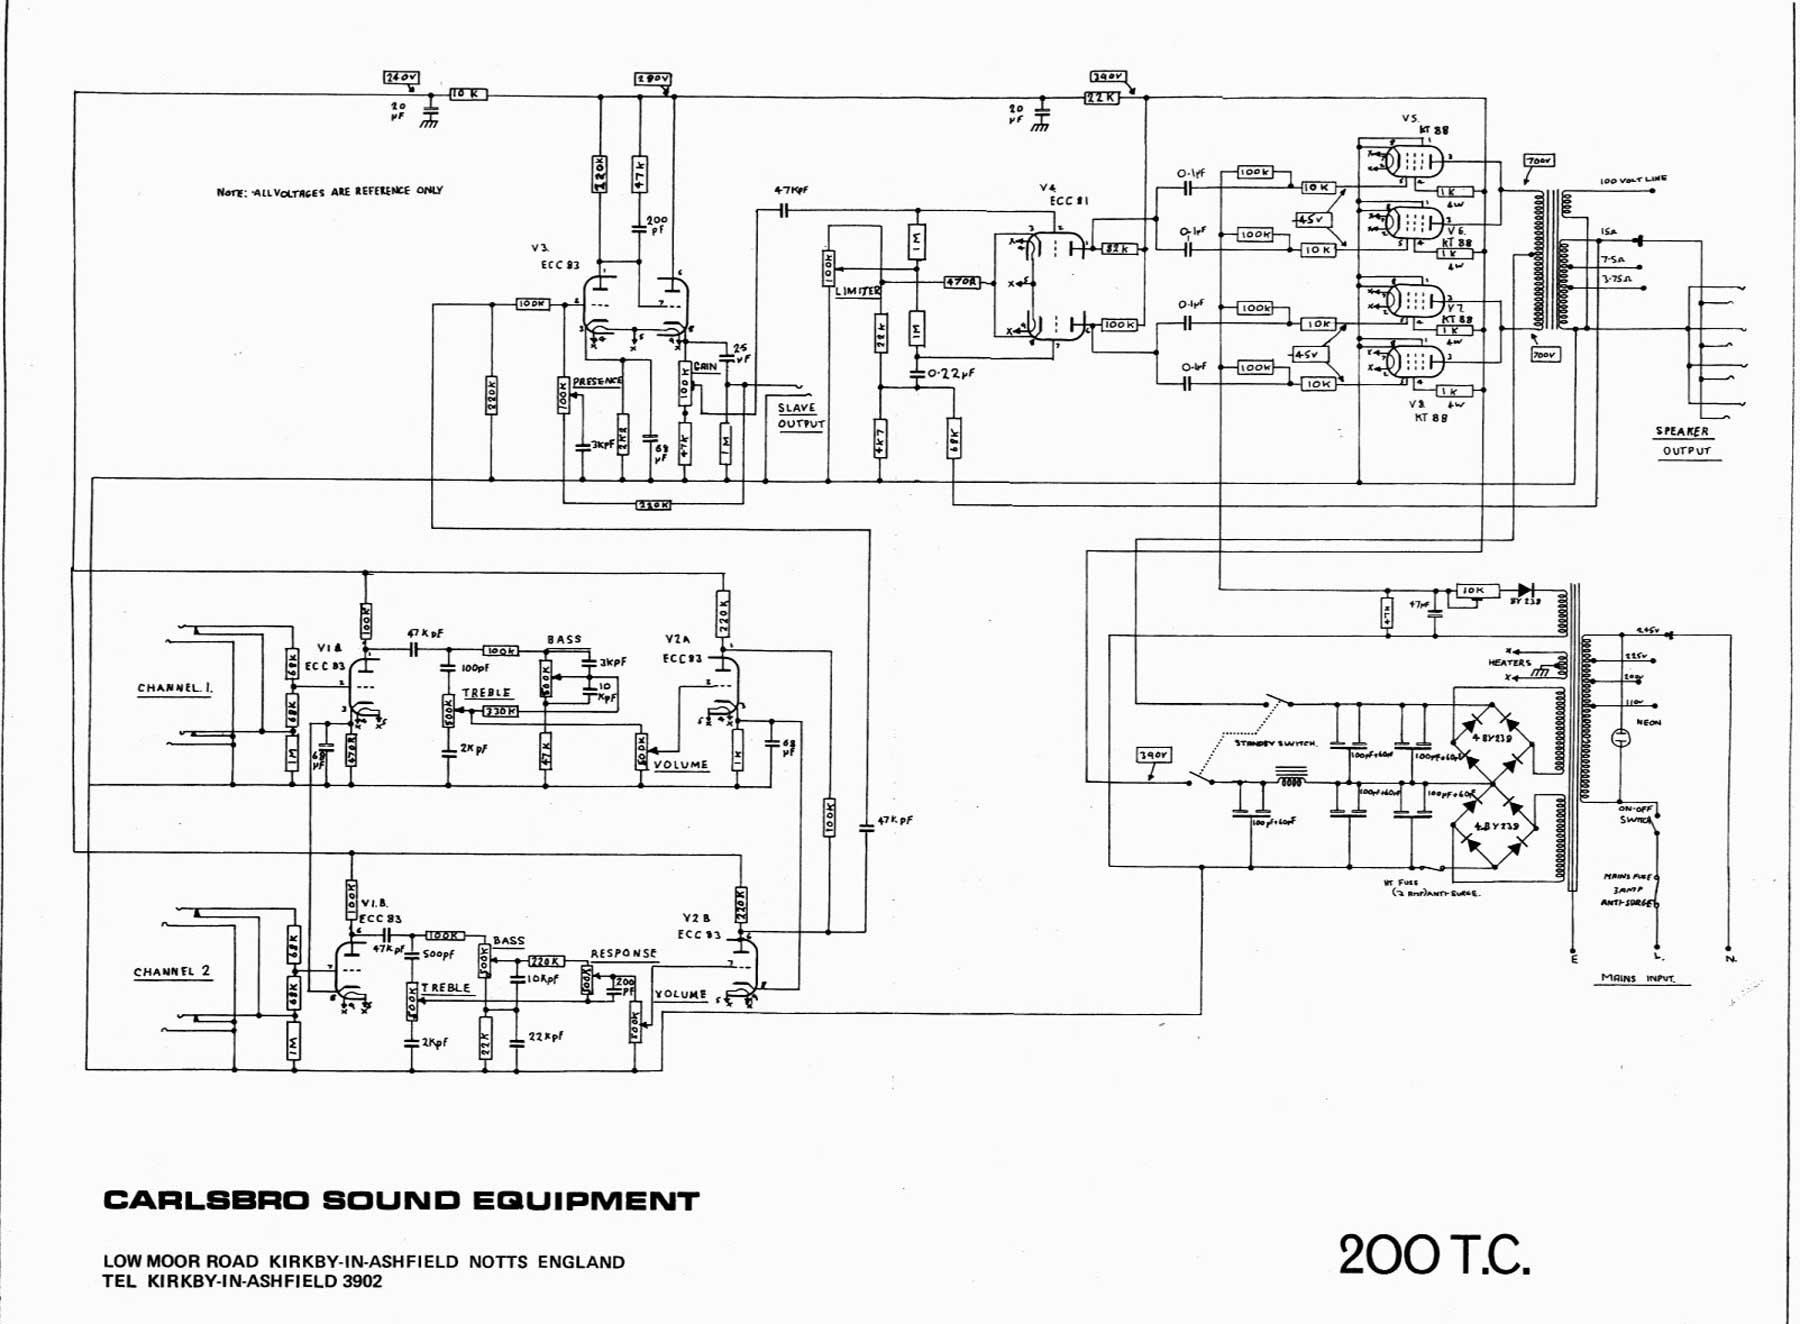 2001 Ford F 250 Radio Wire Diagram Carlsbro 200 T C Amp Schematic